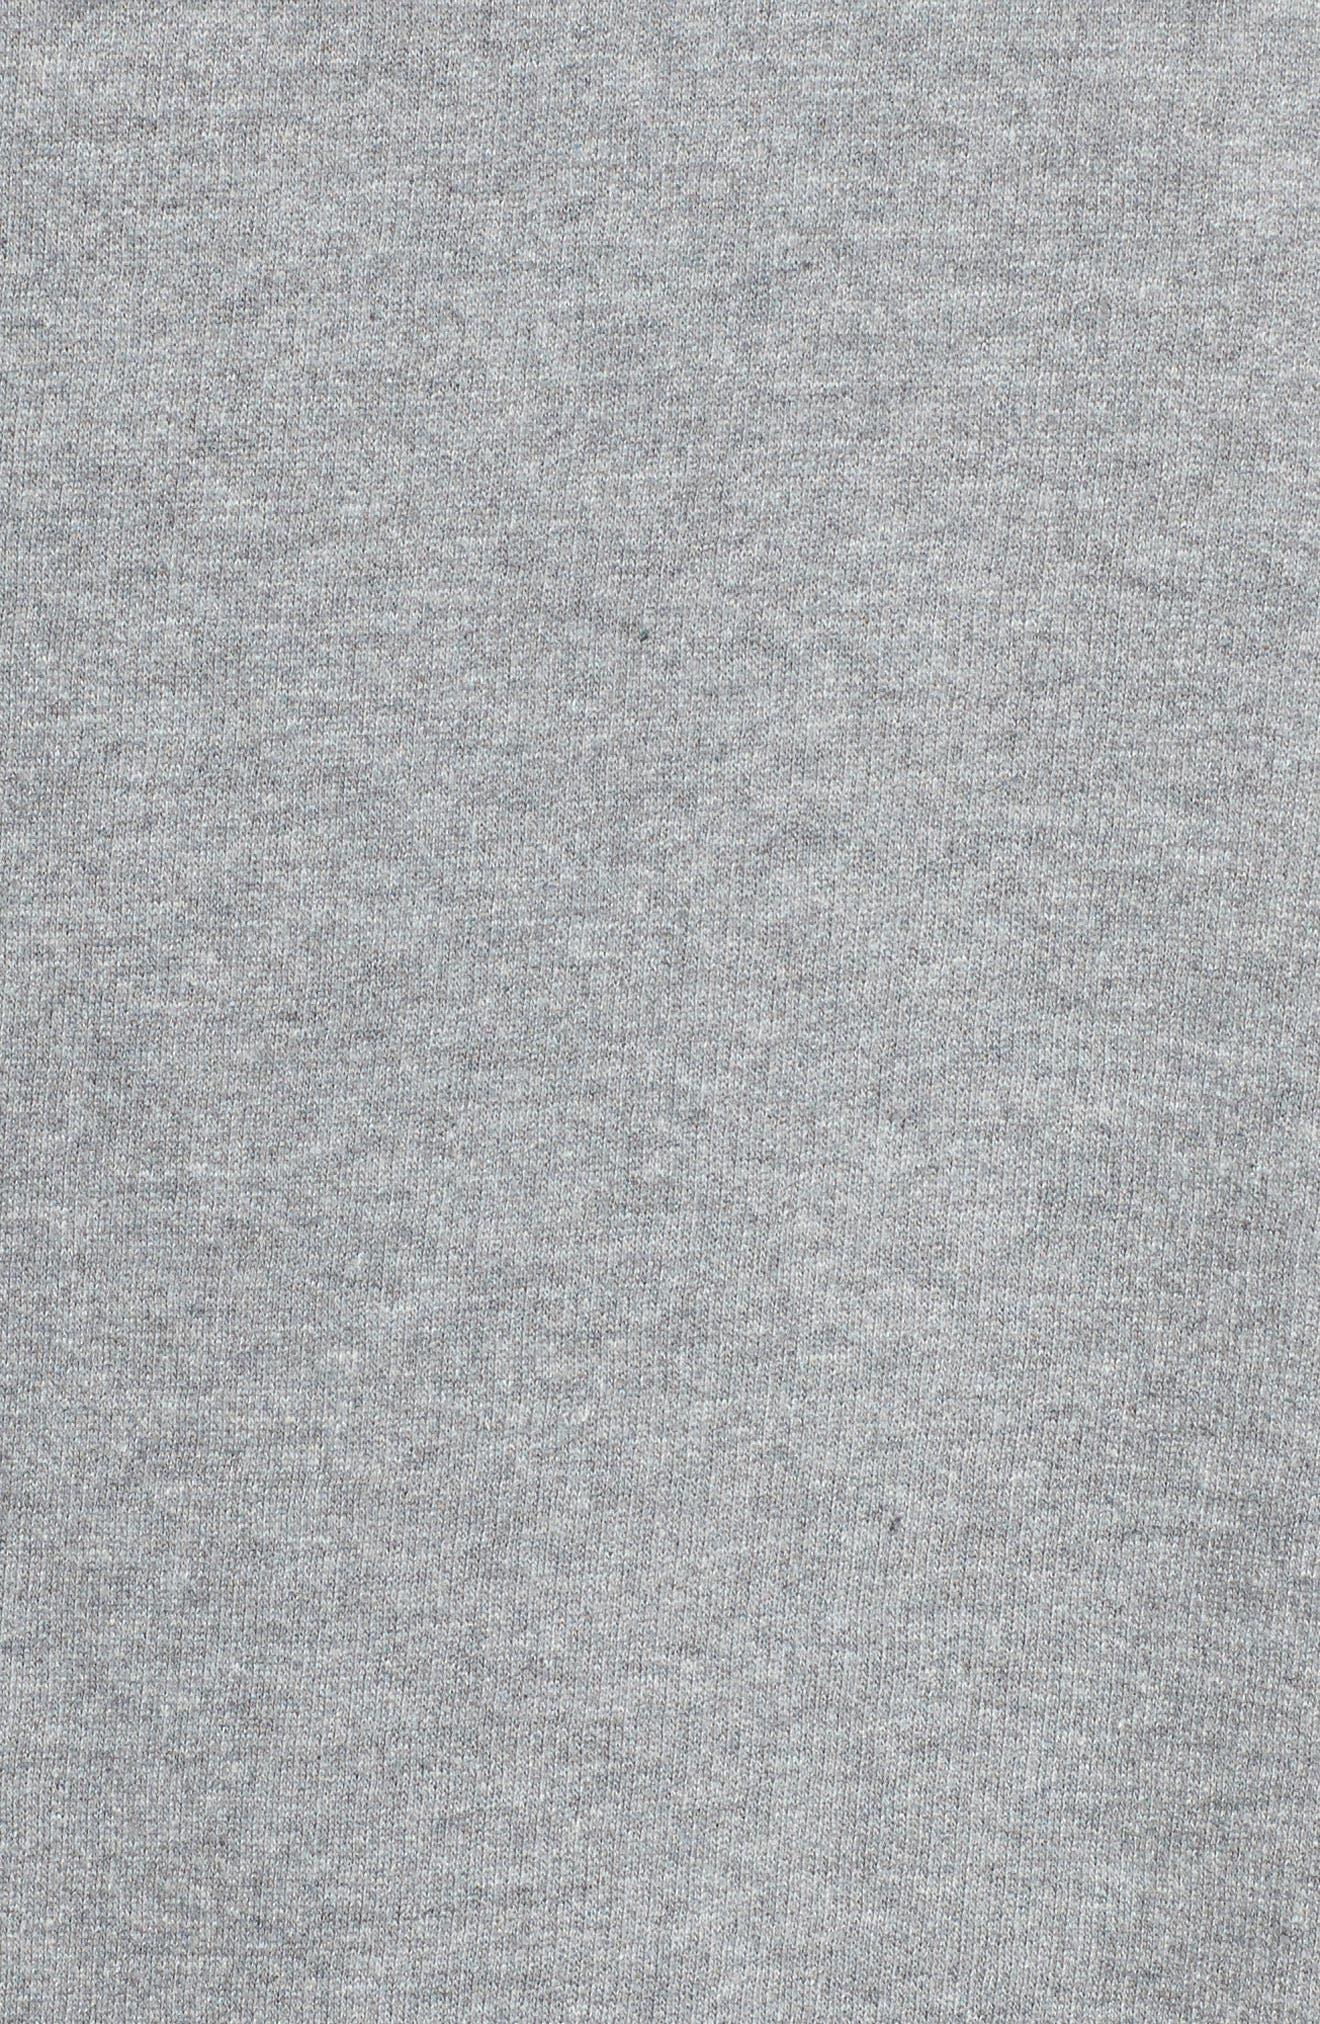 Crewneck Sweatshirt,                             Alternate thumbnail 5, color,                             Heather Grey